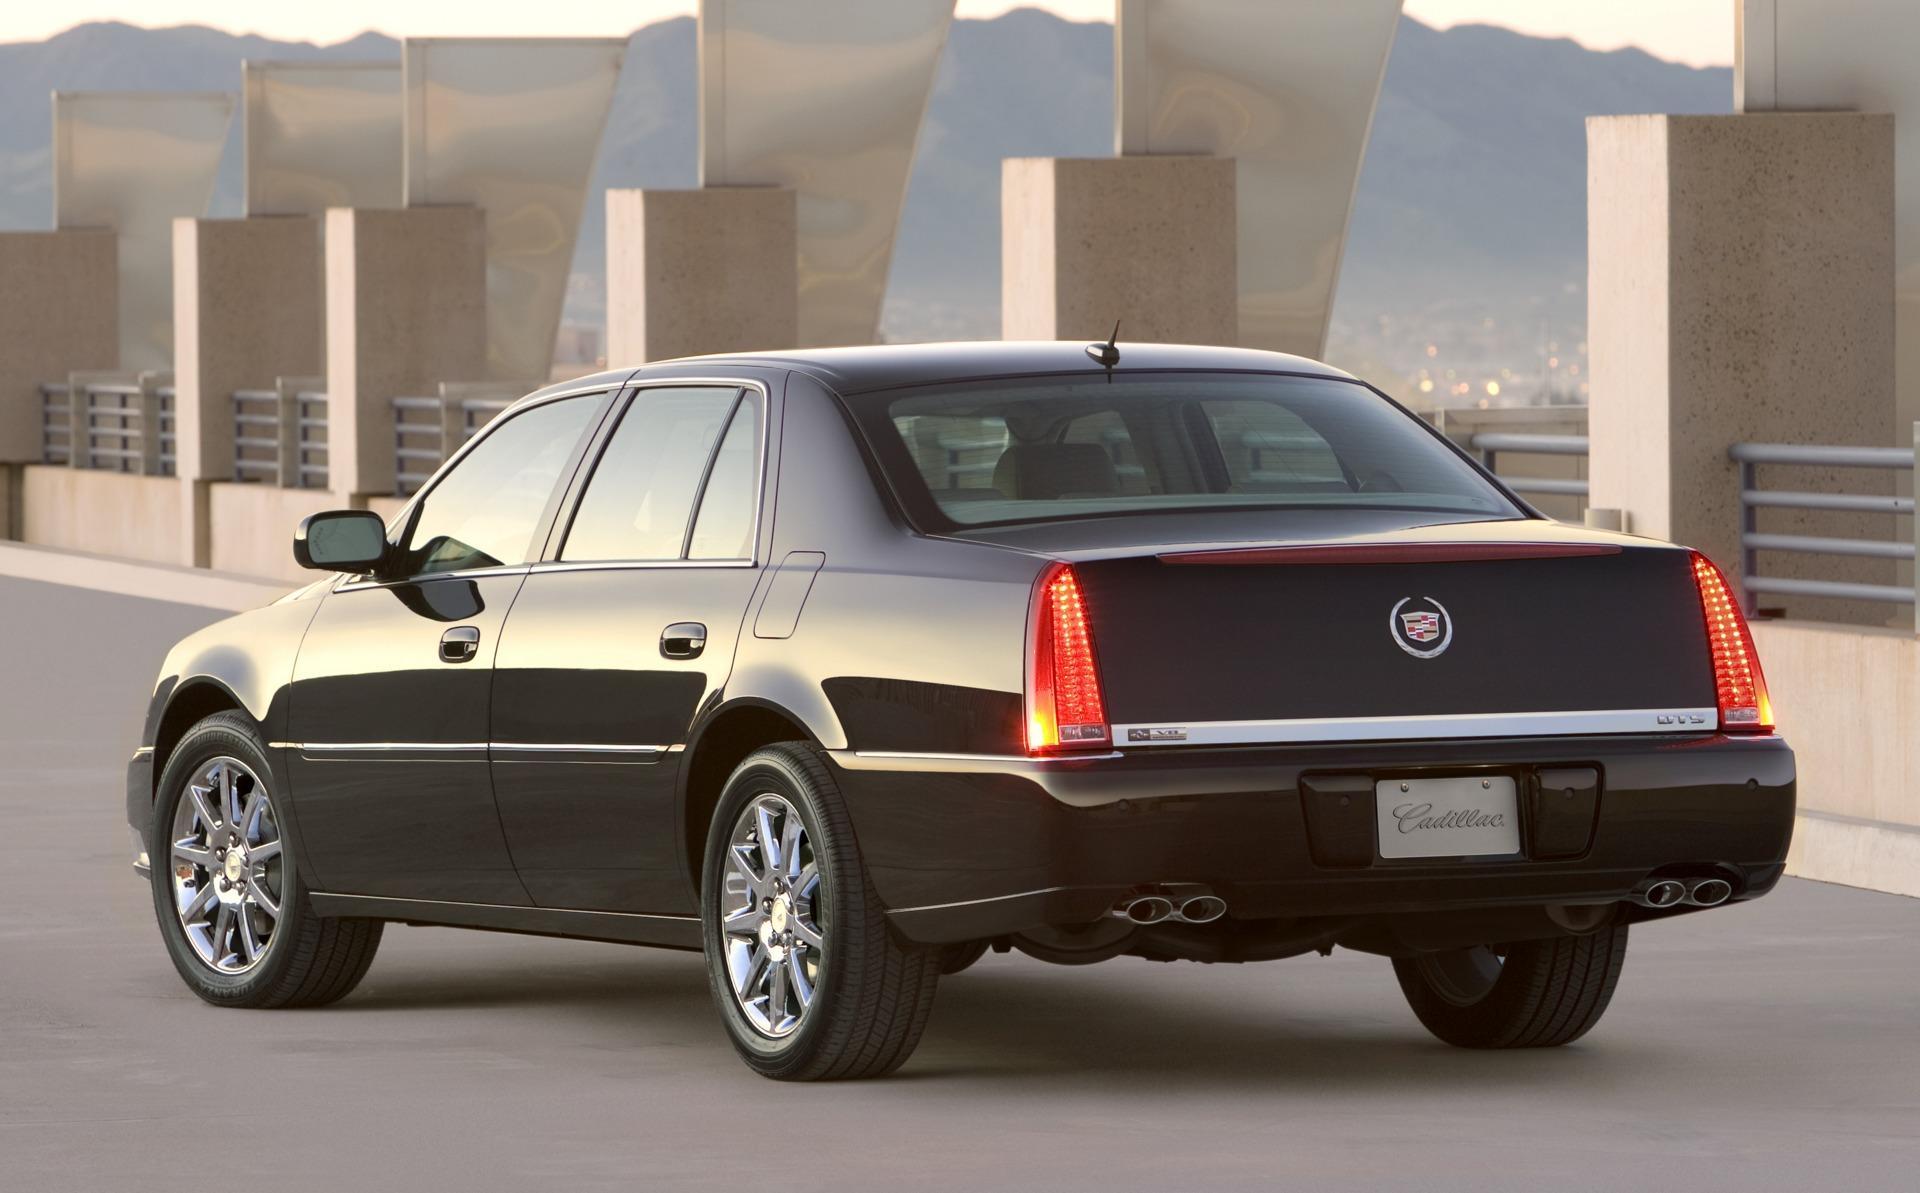 2009 Cadillac DTS - Information and photos - ZombieDrive